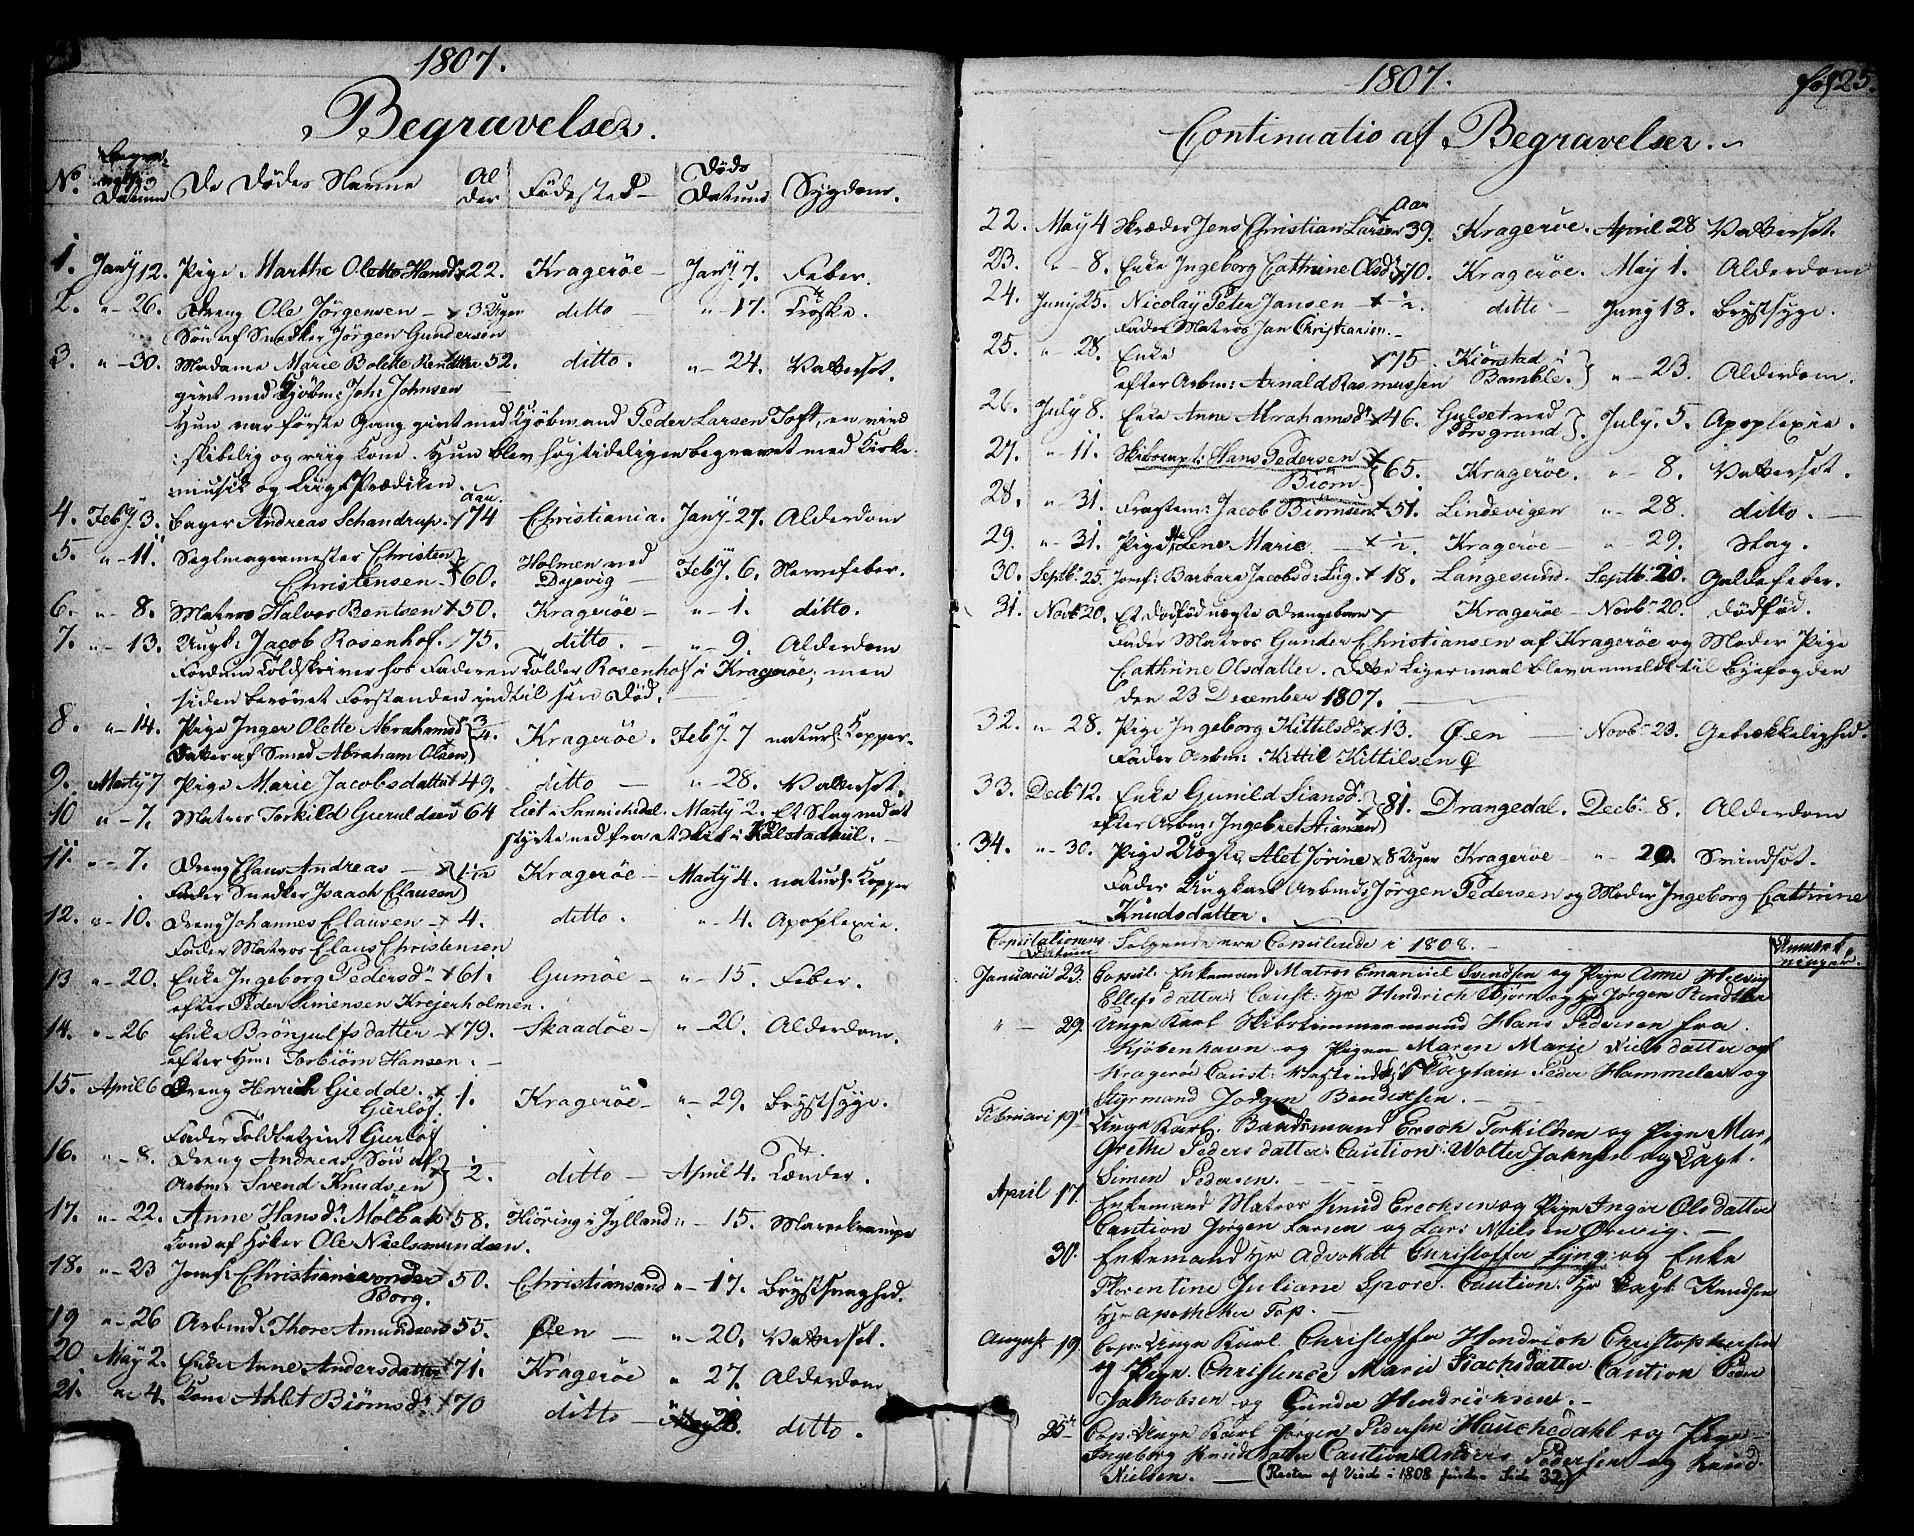 SAKO, Kragerø kirkebøker, F/Fa/L0003: Ministerialbok nr. 3, 1802-1813, s. 25